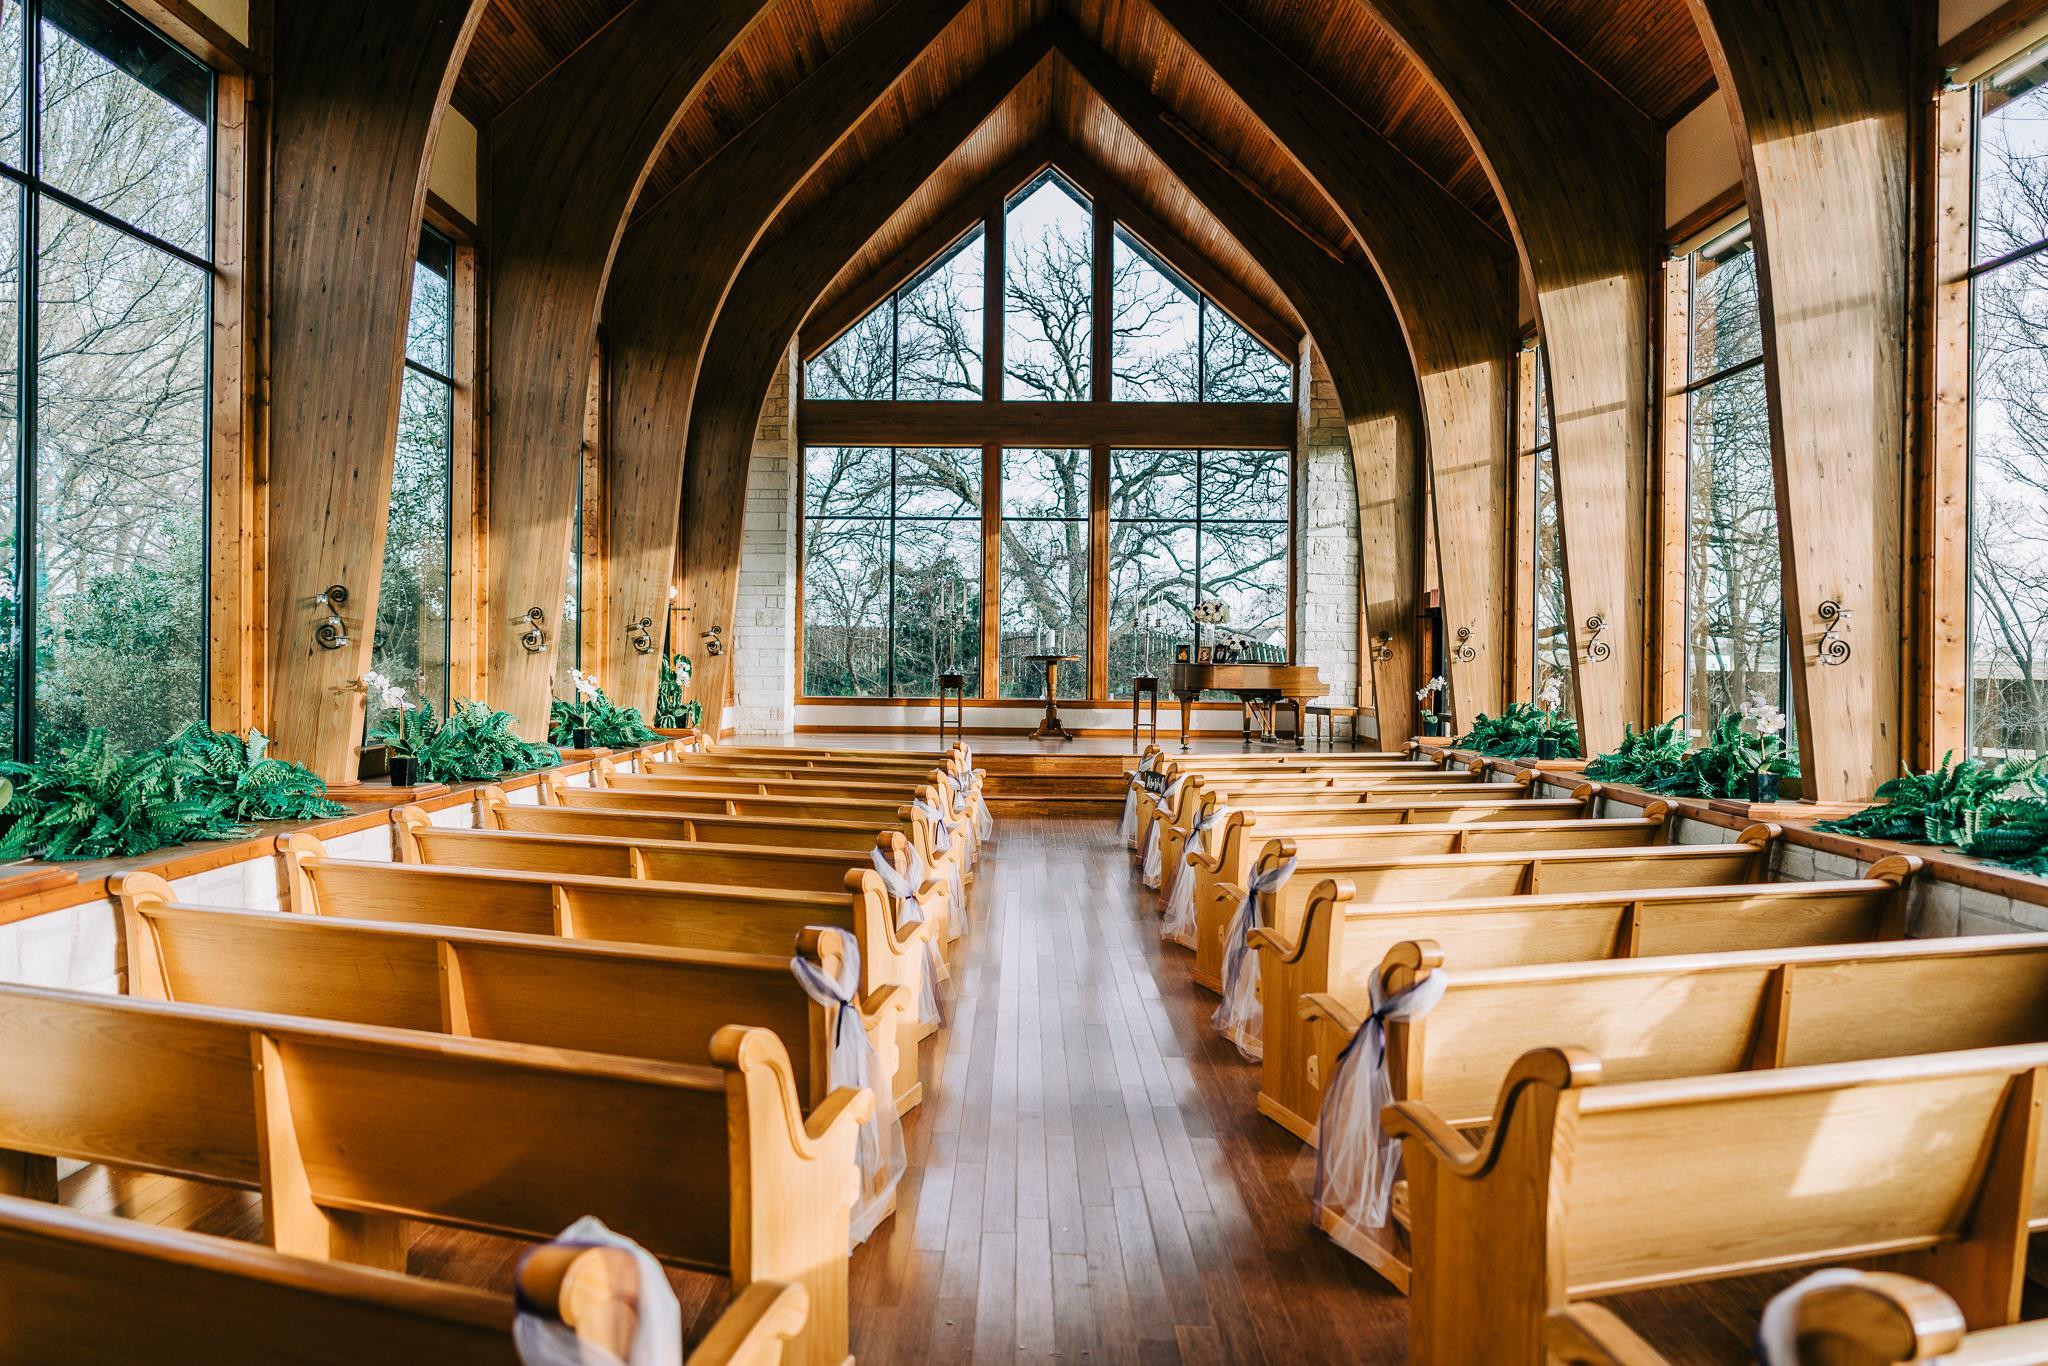 North-Texas-Wedding-Florist-David-Co.-Harmony-Chapel44.jpg